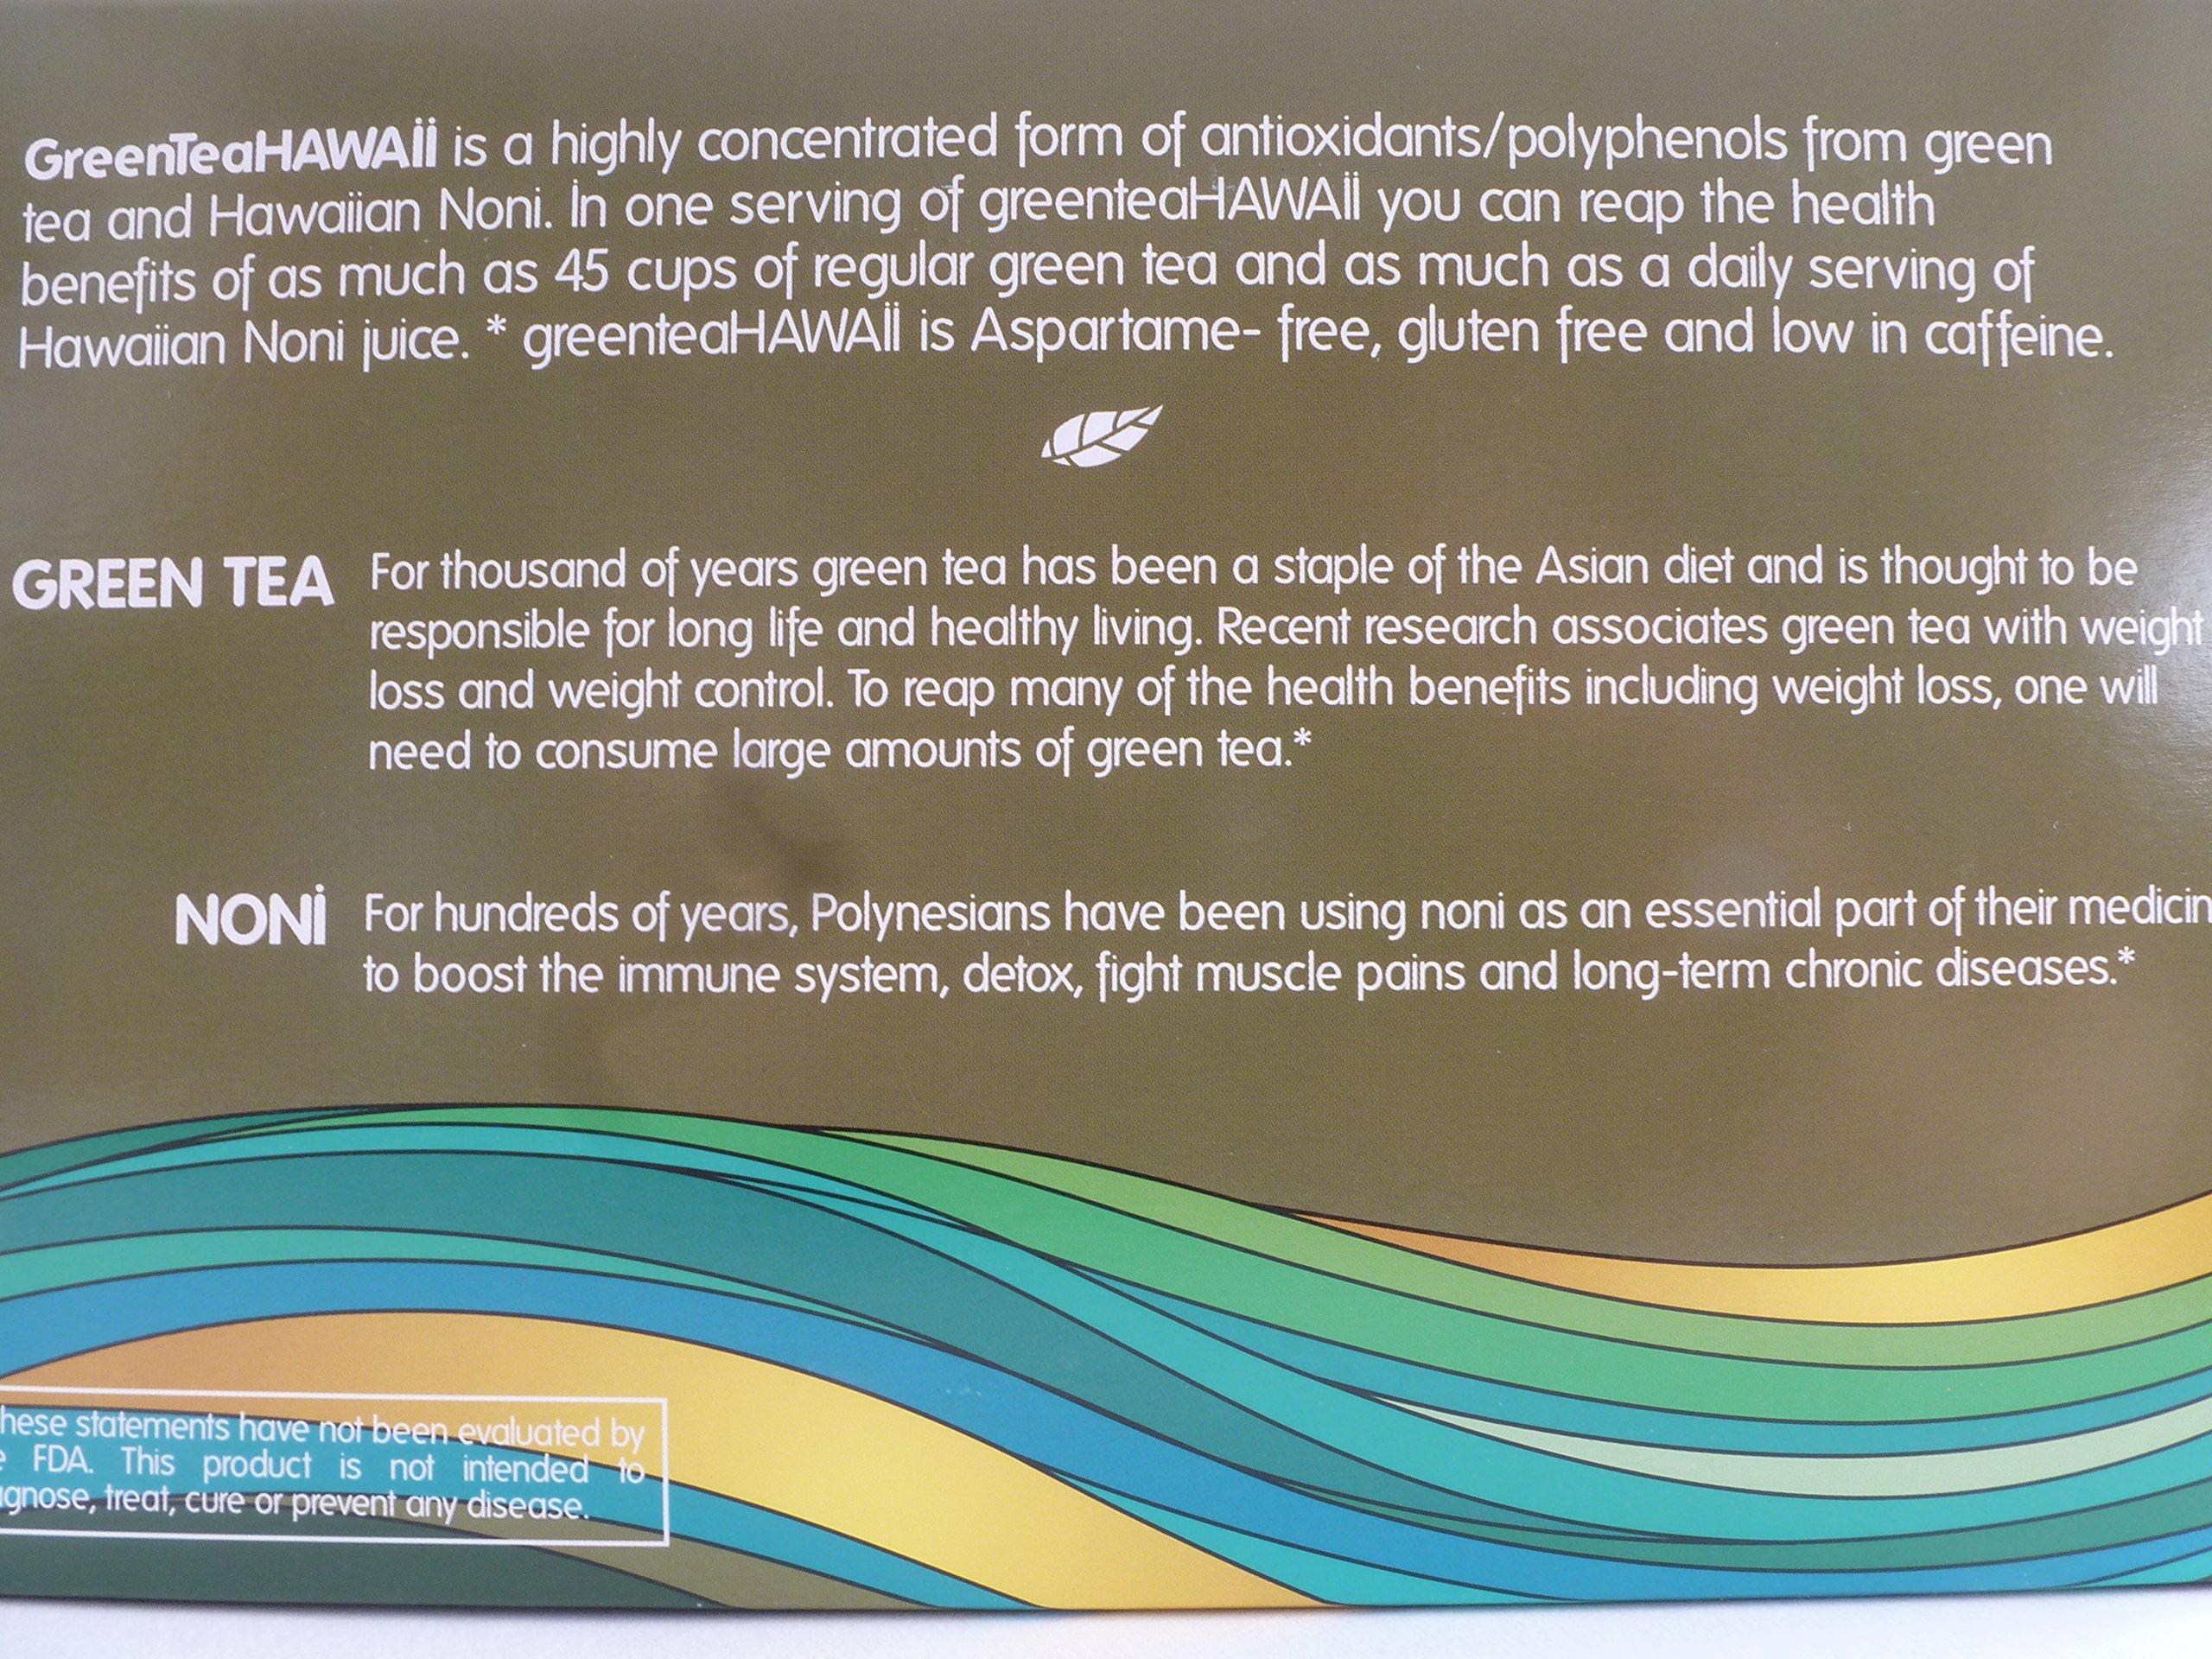 Green Tea Hawaii (Variety Pack) Powder with Noni, 60 Packets, 540 mg of Antioxidants/Polyphenols, All Natural by greenteaHAWAII (Image #2)